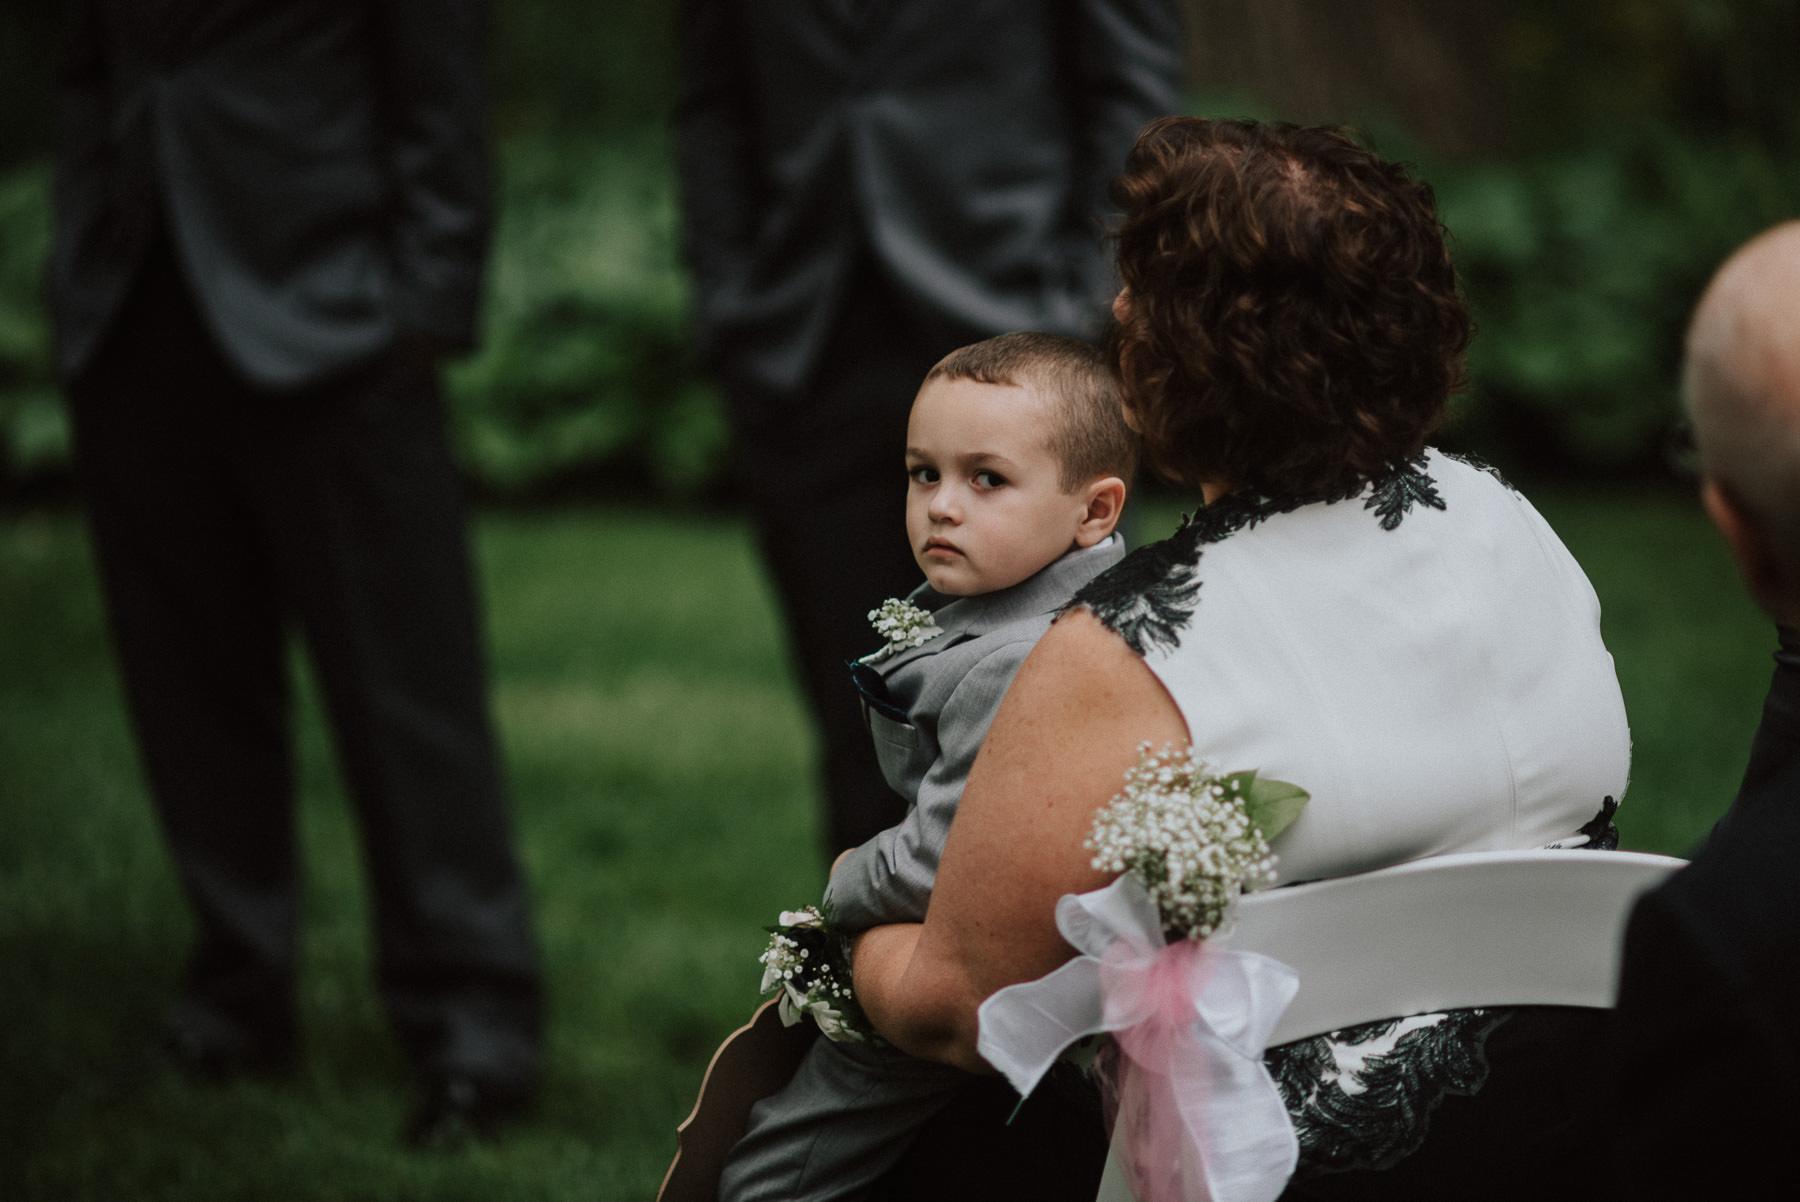 appleford-estate-wedding-photography-63.jpg